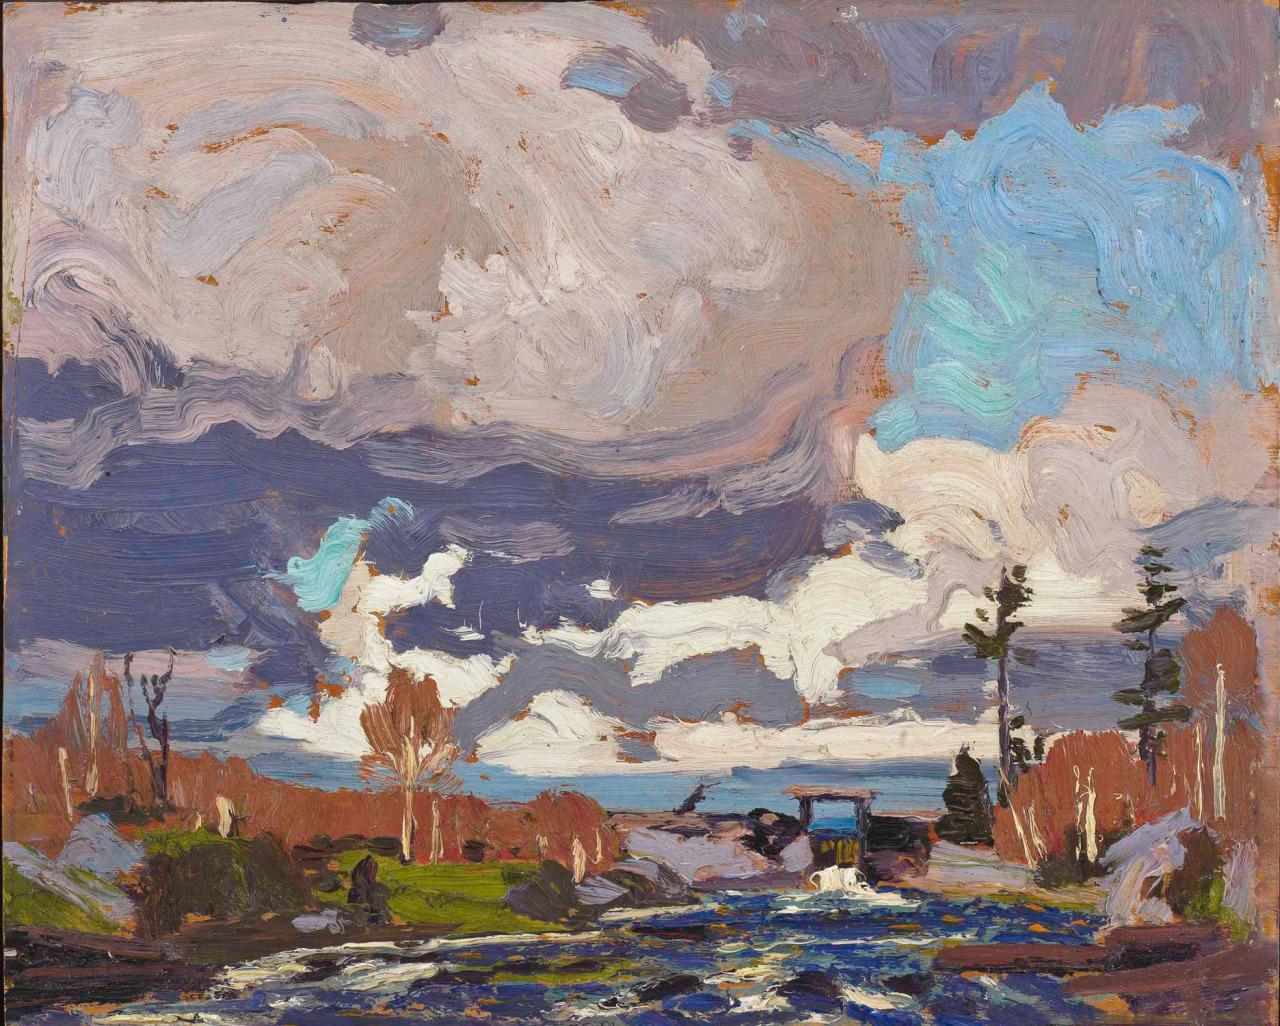 lawrenceleemagnuson:  Tom Thompson (Canada 1877-1917) Tea Lake Dam,Spring 1917oil on wood panel 21.3 x 26.2 cm